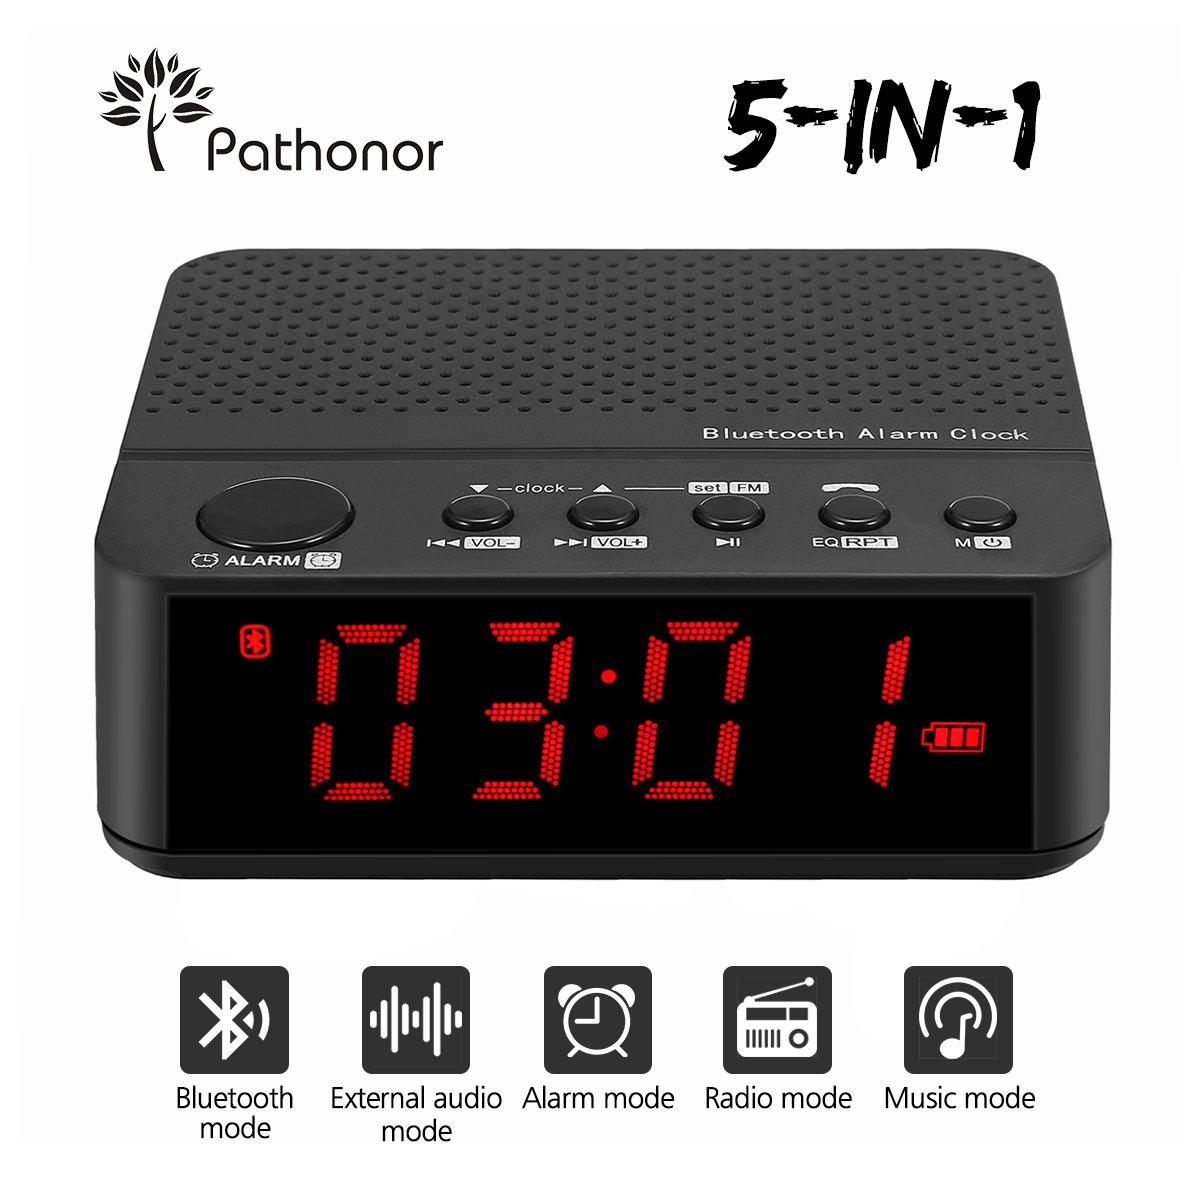 Bluetooth Speaker Alarm Clock Radio Pathonor FM Alarm Clock, LED Digital Alarm Clock, Wireless Bluetooth Snooze Clock, Alarm Clock Portable with USB Charging Port Black